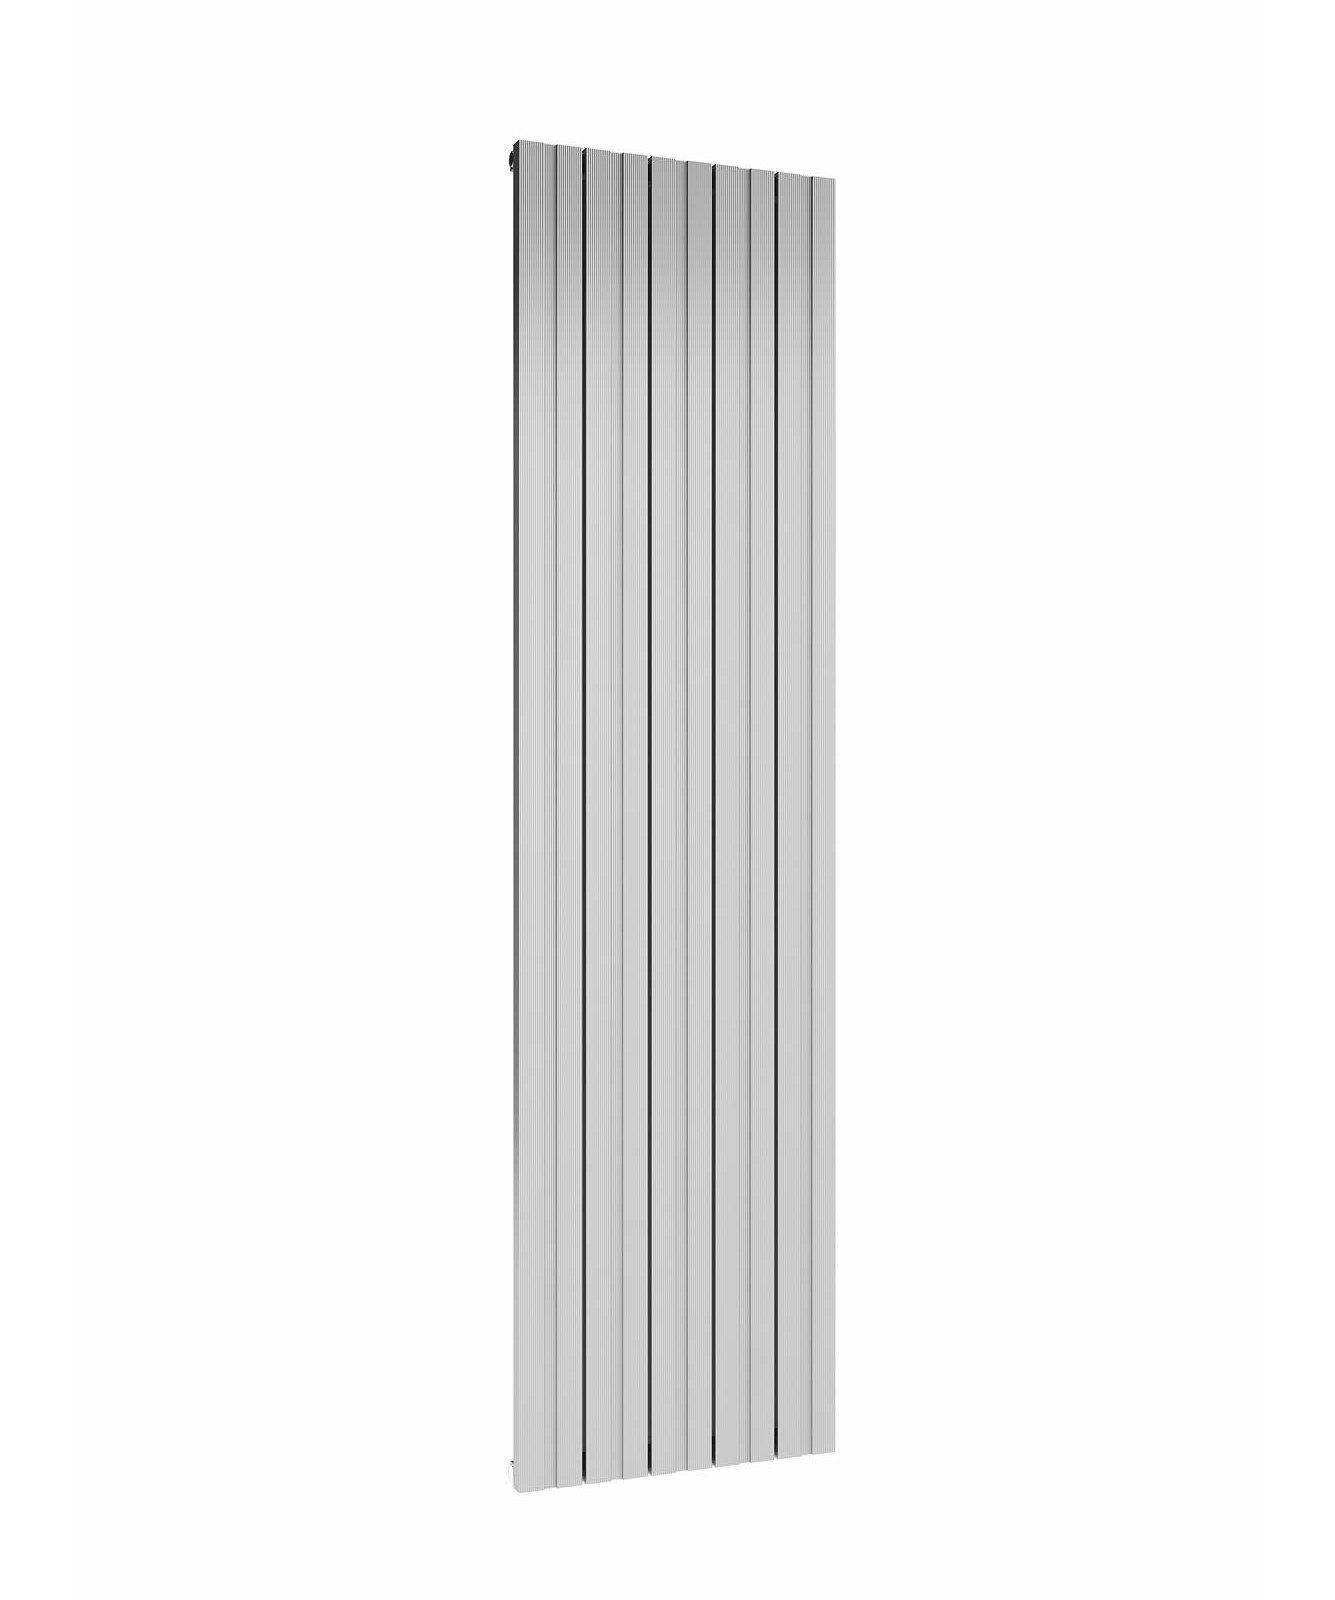 Reina Bova Aluminium Vertical Double Designer Radiator